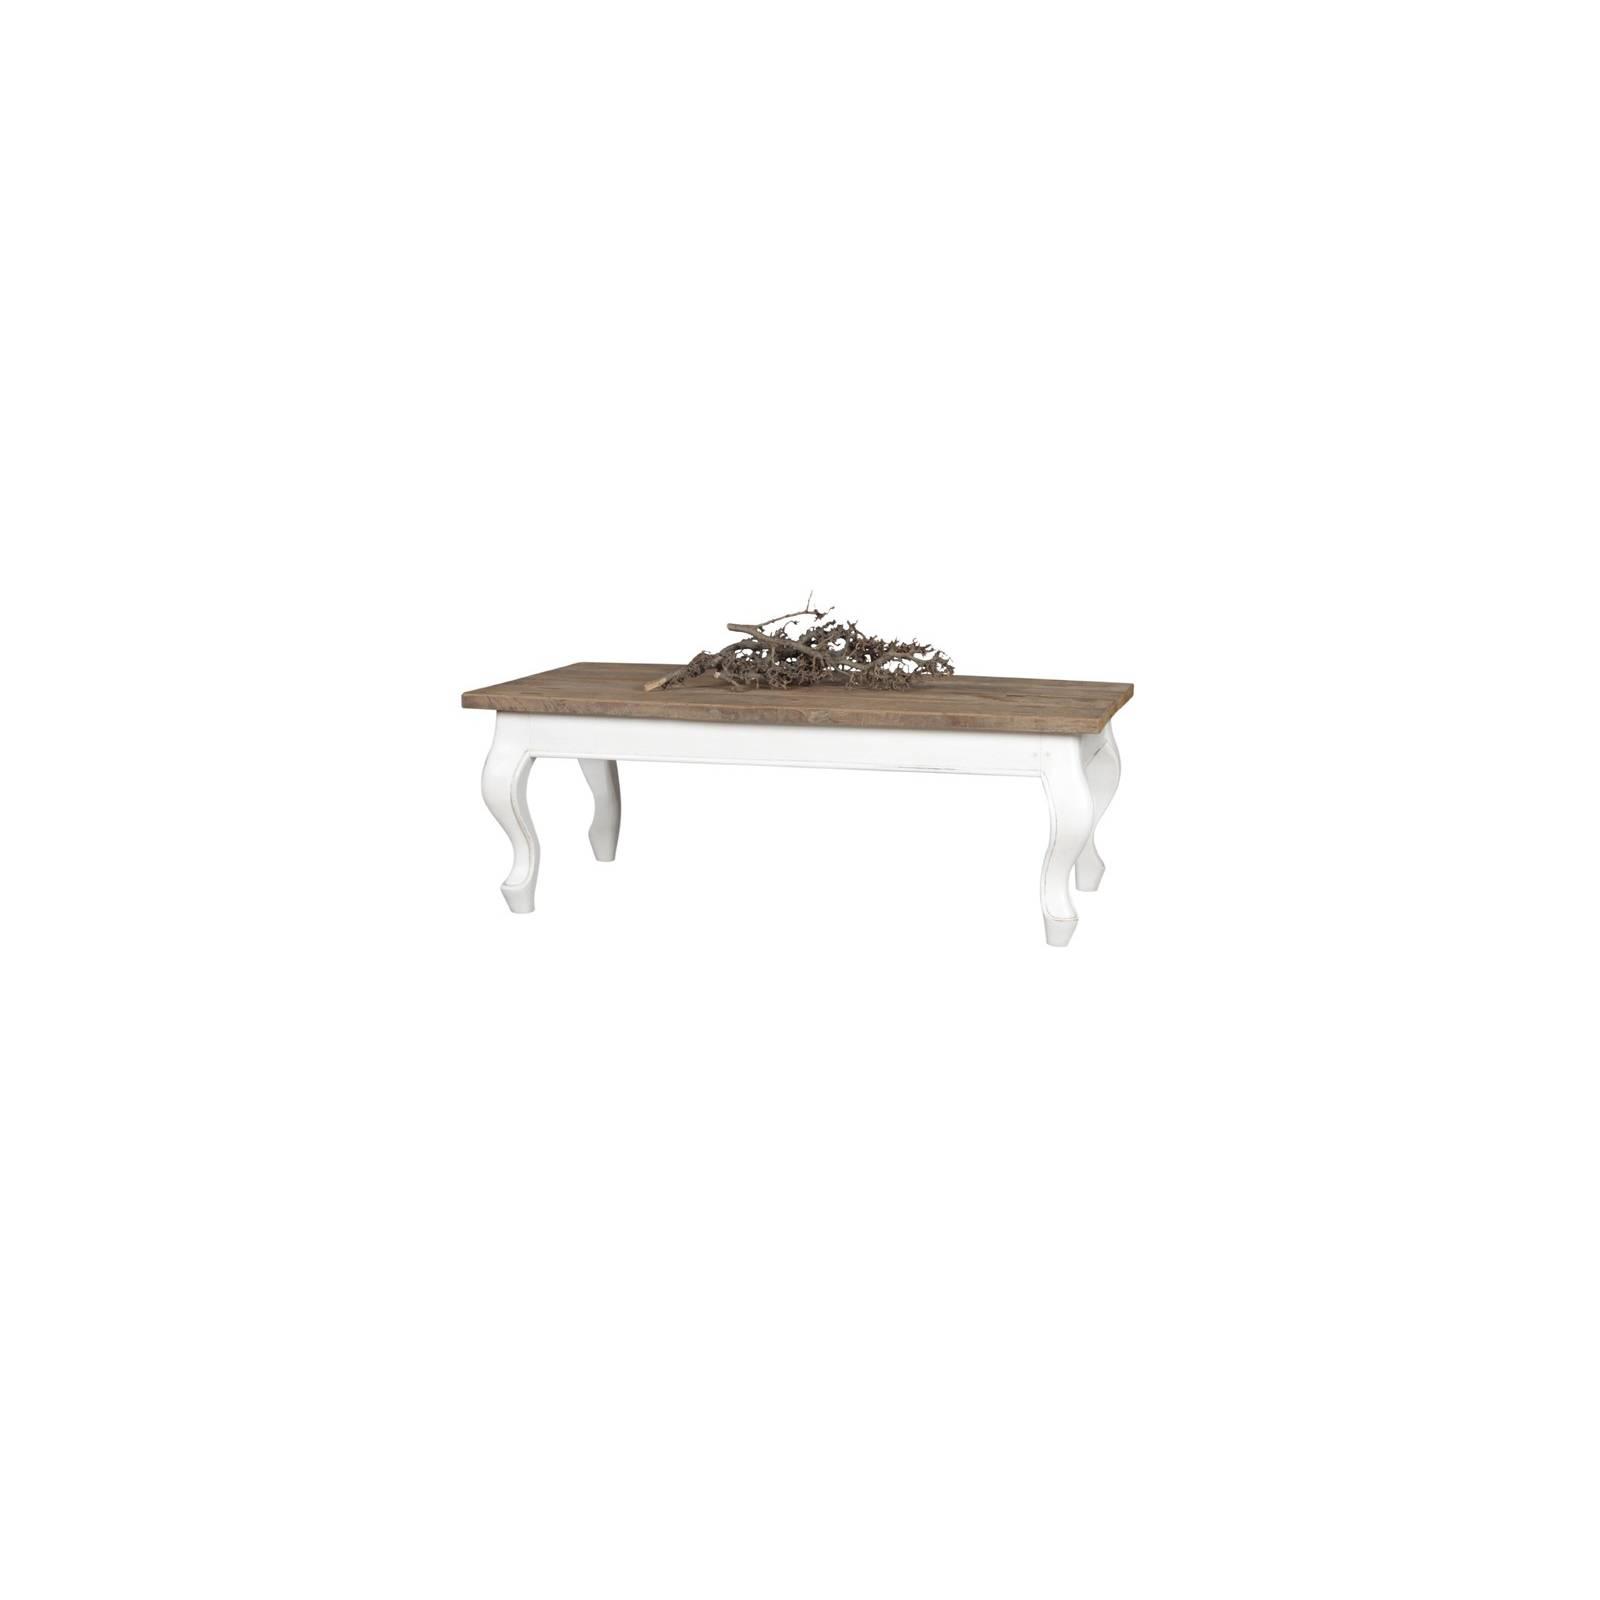 Table Basse Rectangulaire Baroque Olimpia Teck - meuble teck massif